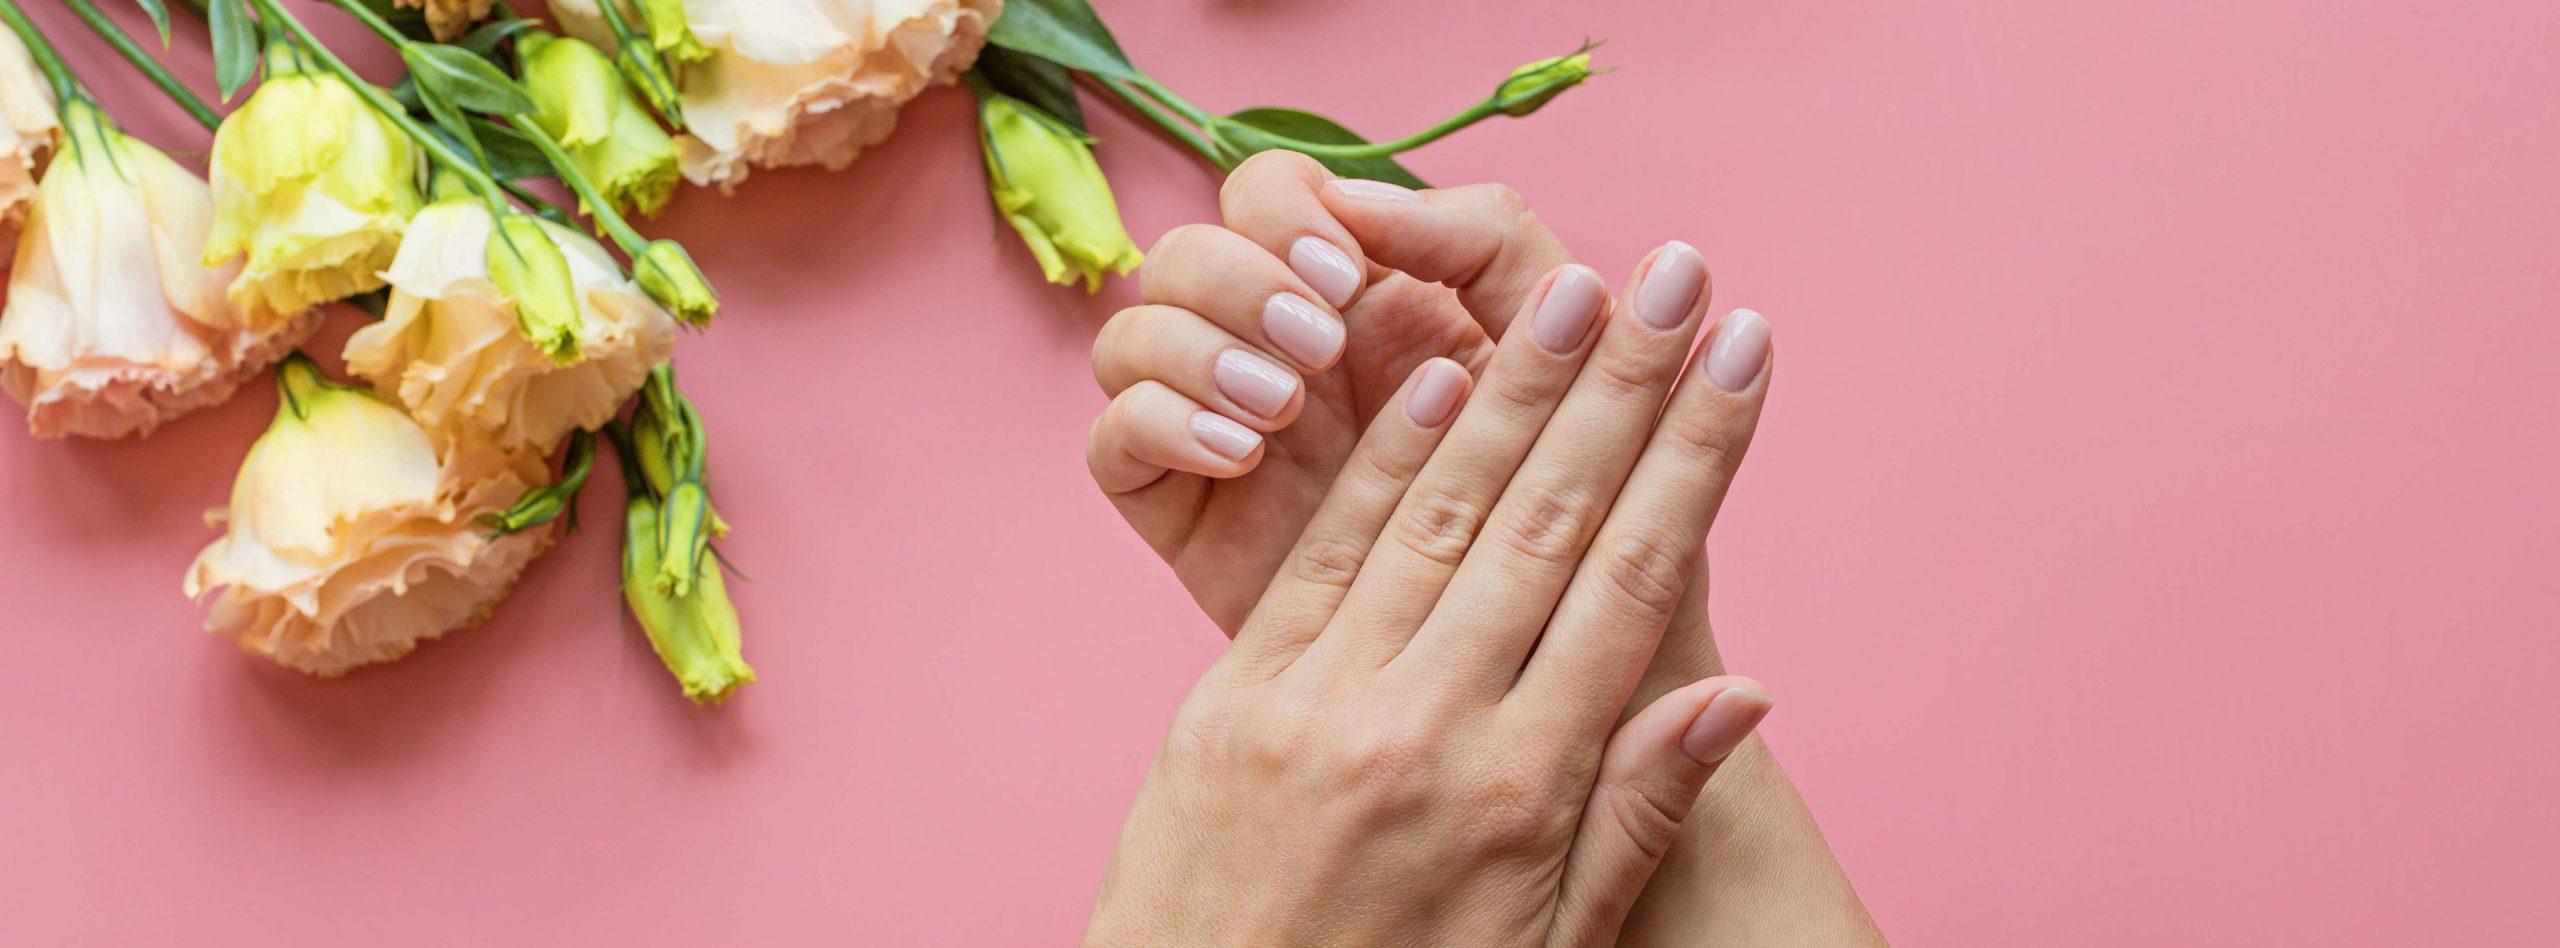 woman-hands-manicure-manicured-nails-gel-polish-fa-MCCBCFJ